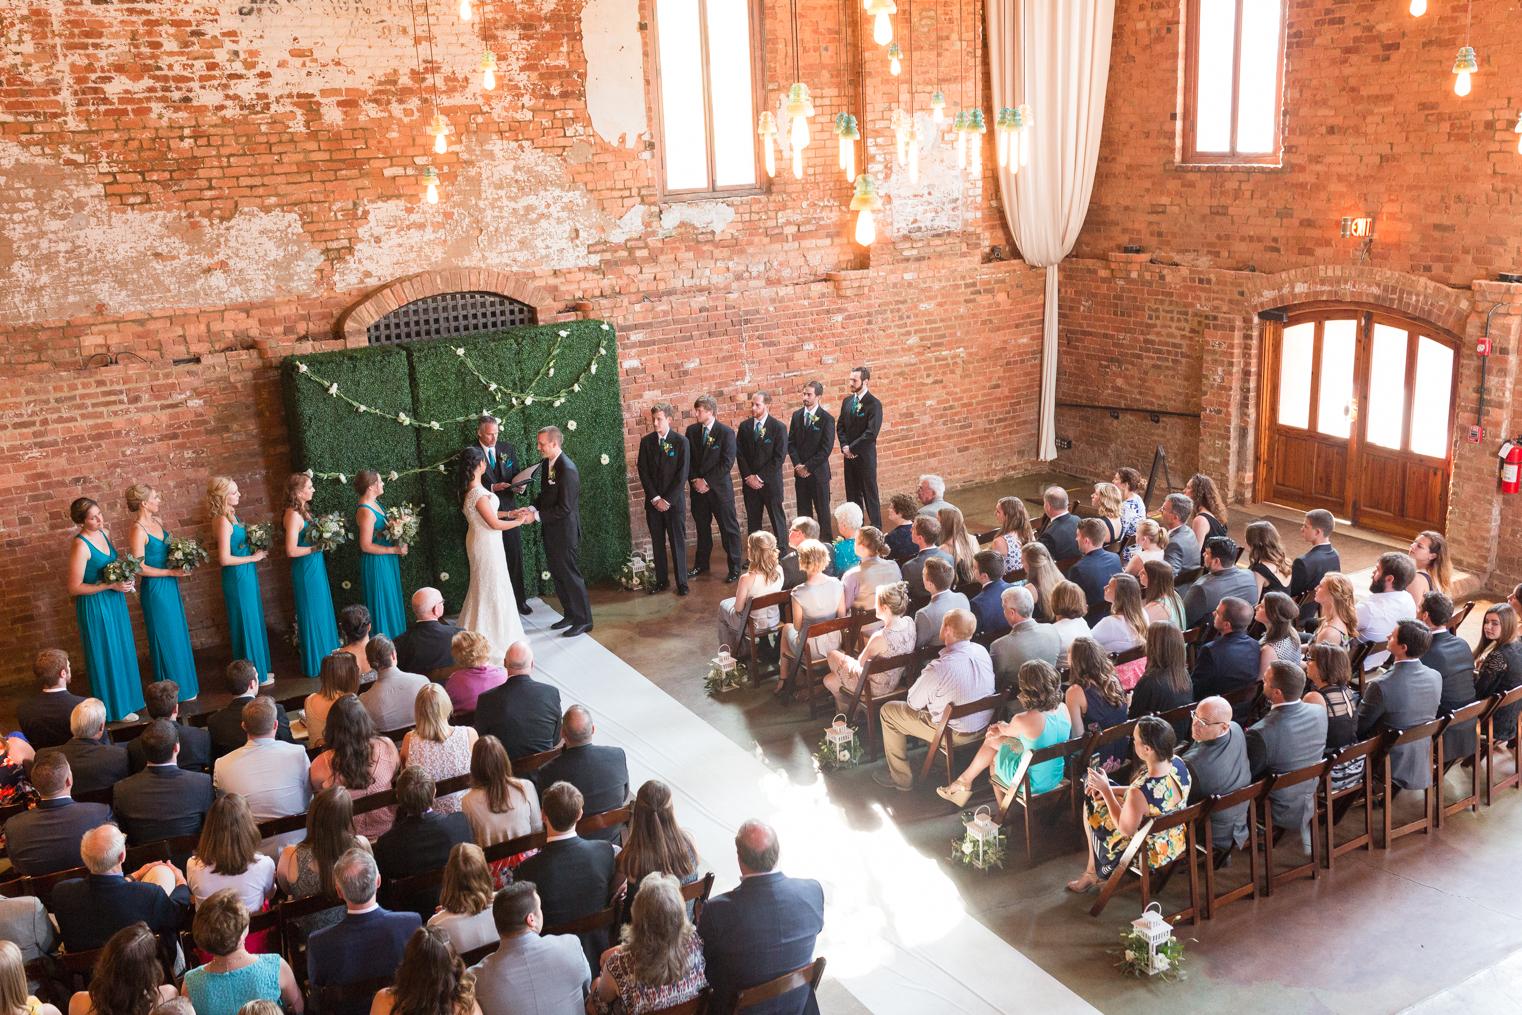 170527-MM-Old-Cigar-Warehouse-Wedding-244.jpg